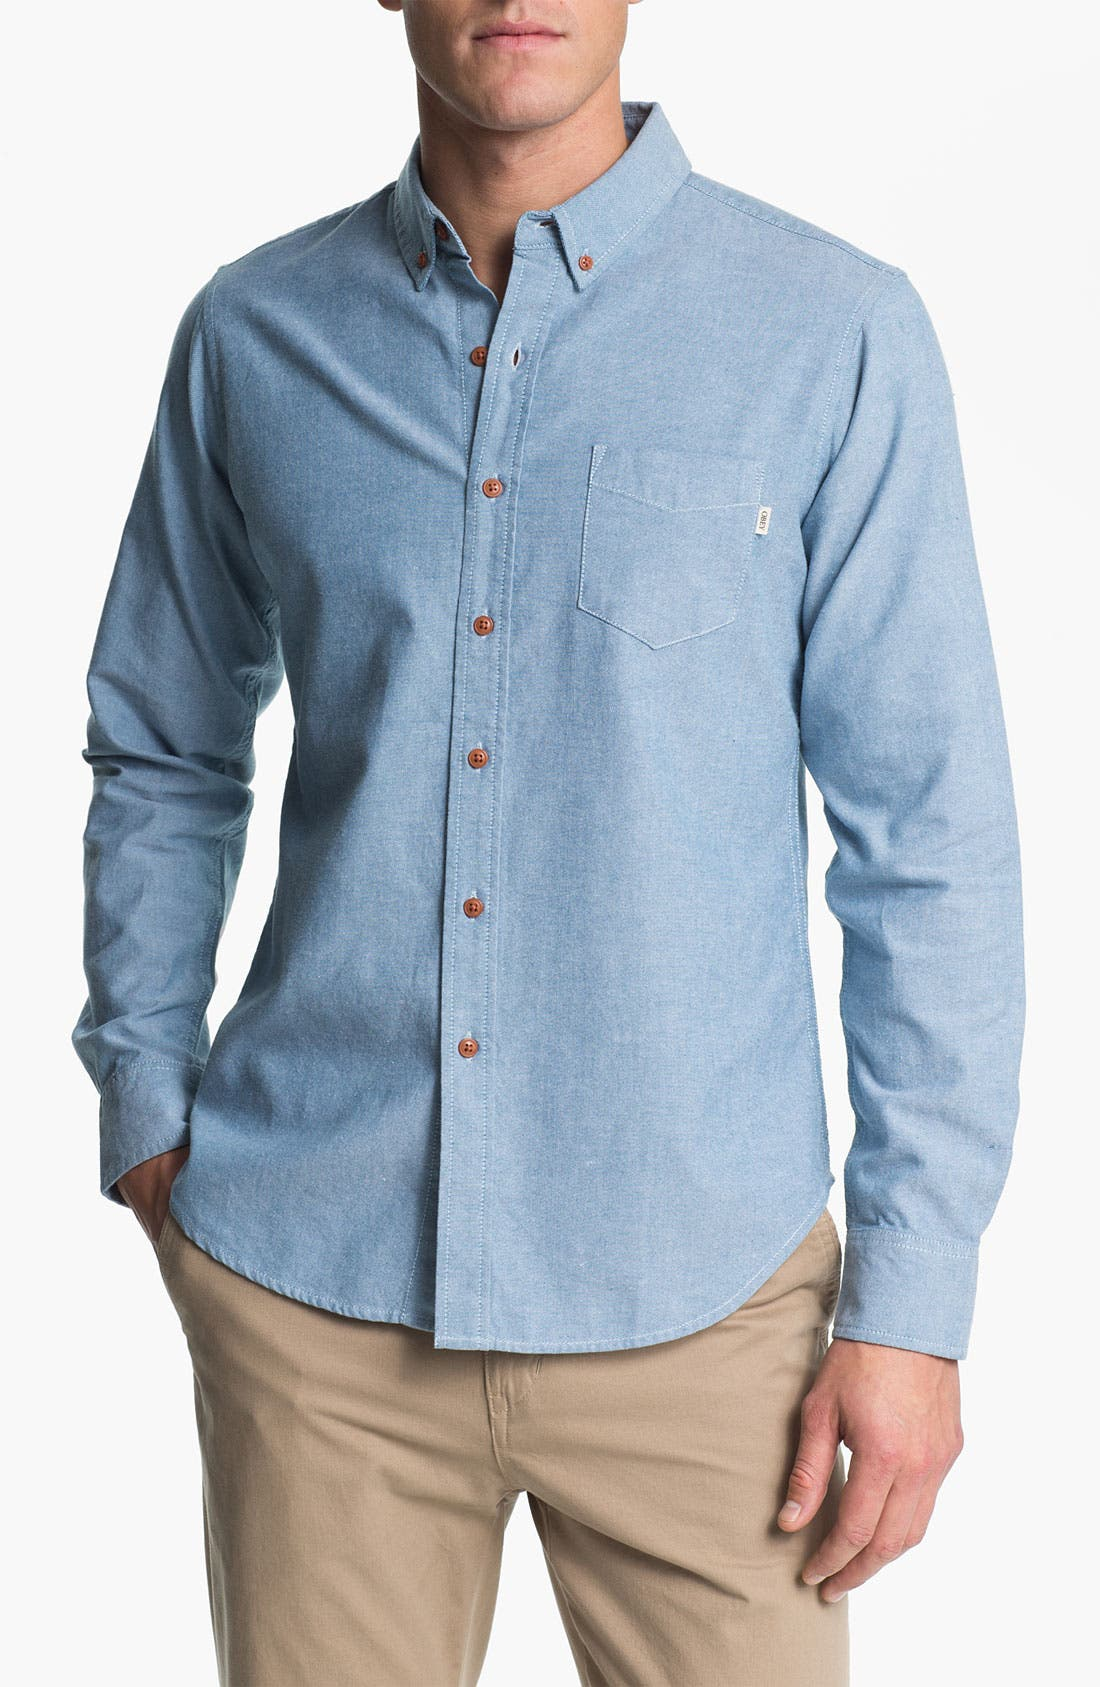 Alternate Image 1 Selected - Obey 'Ryan' Chambray Shirt